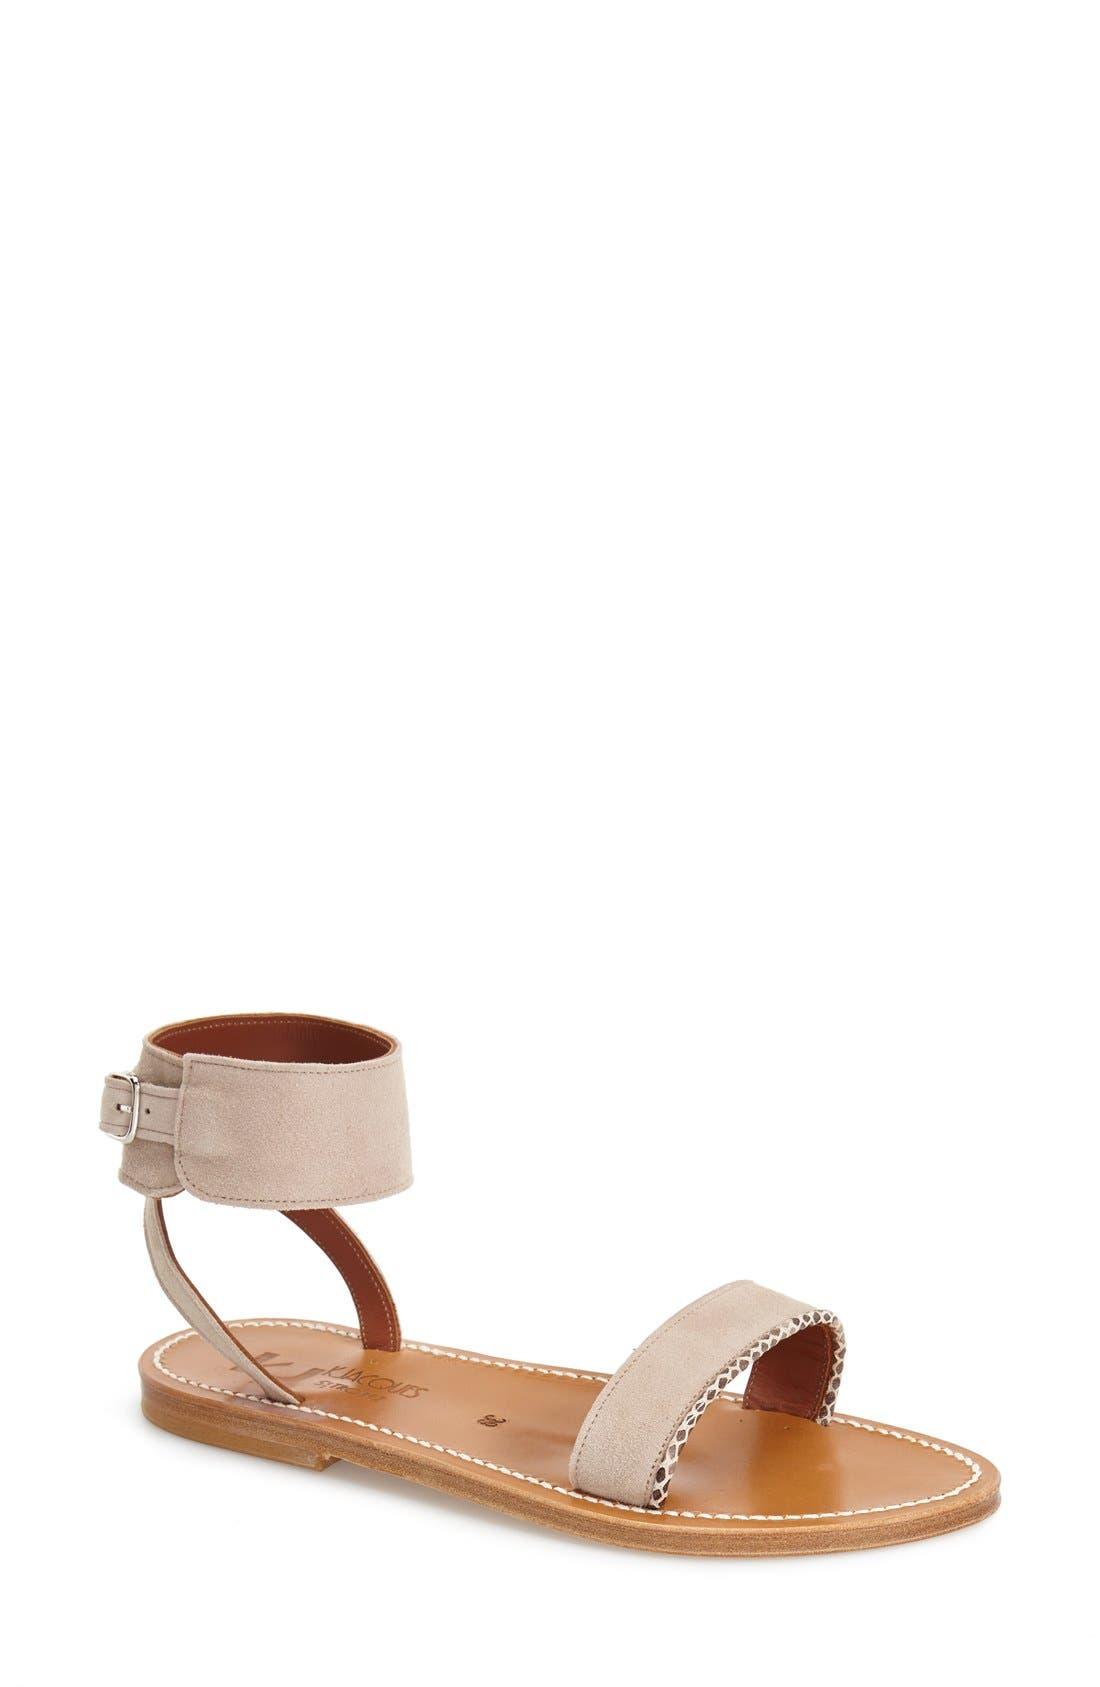 Alternate Image 1 Selected - K.Jacques St. Tropez 'Saratoga' Ankle Strap Sandal